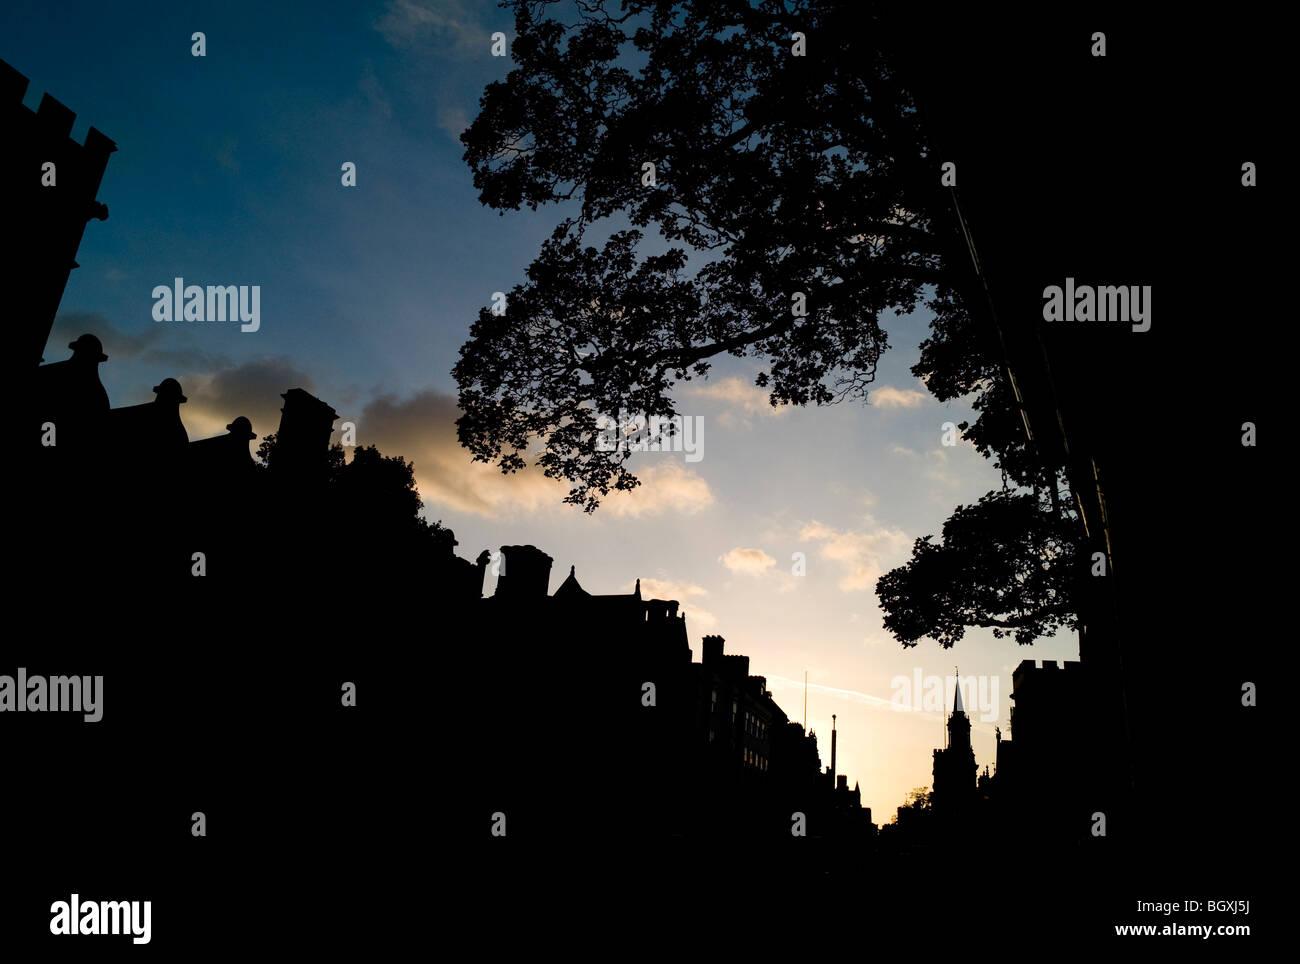 University Silhouette Architecture Stock Photos